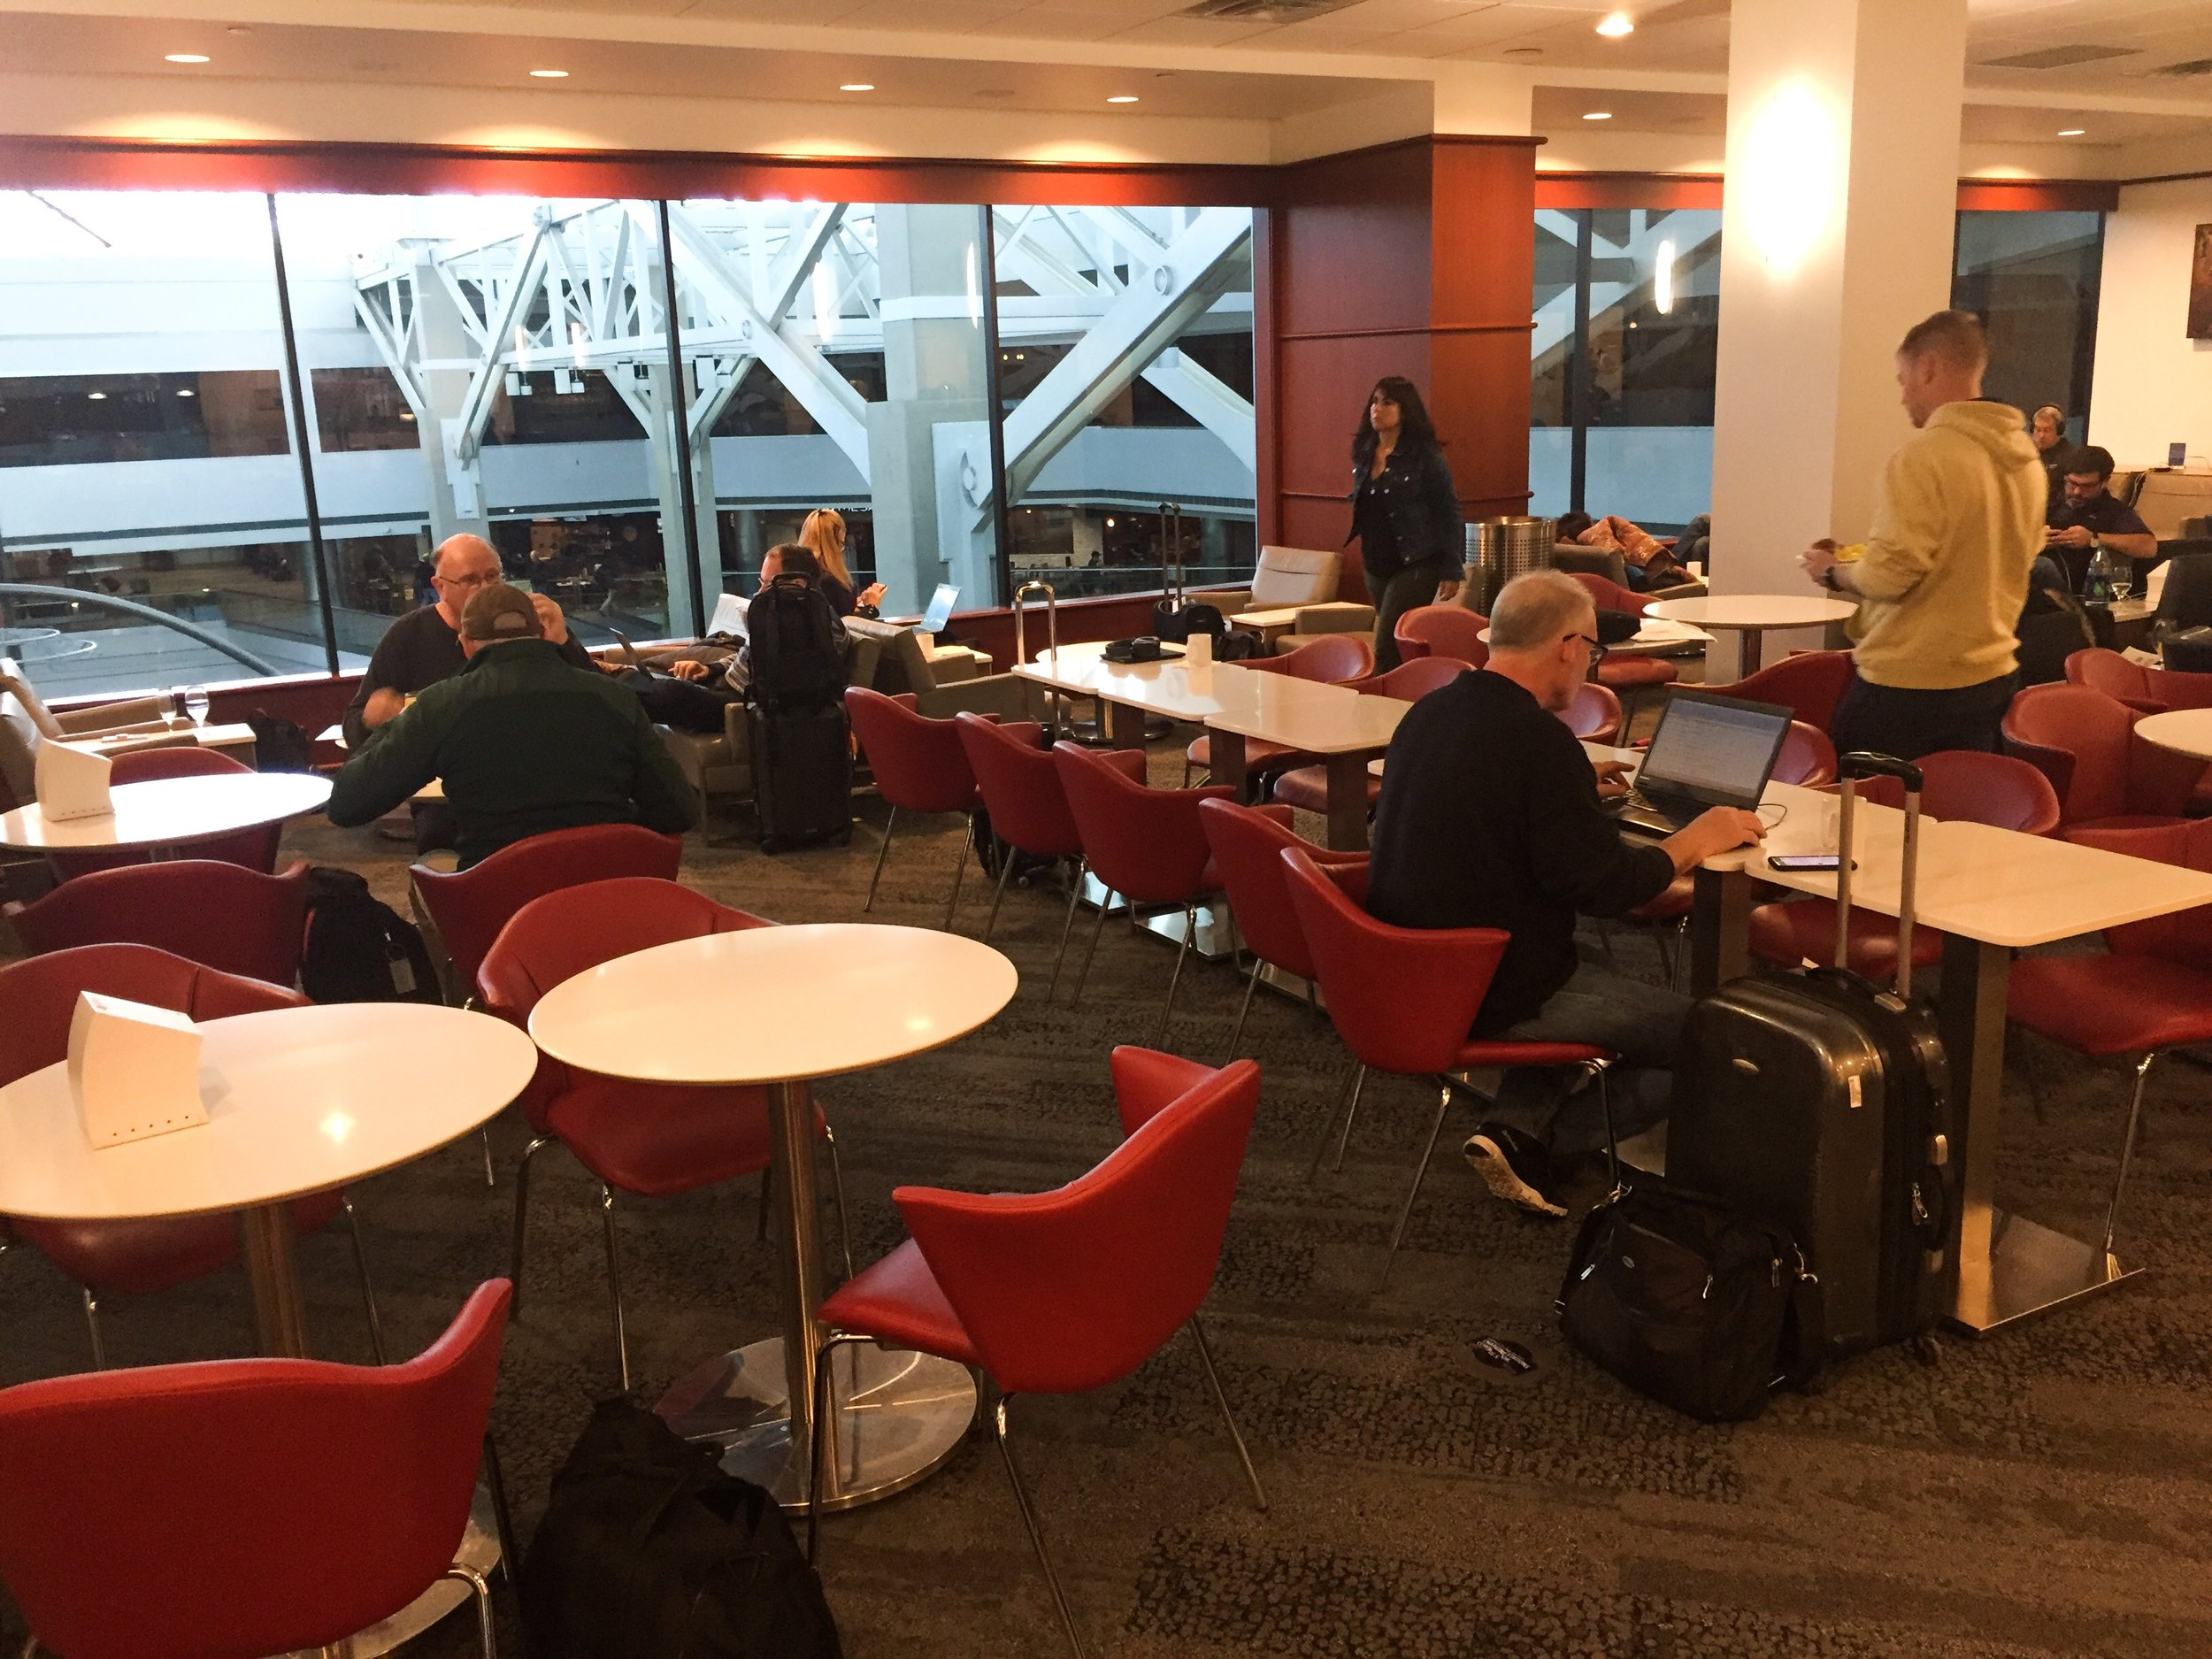 DENVER - Terminal A Mezzanine Level